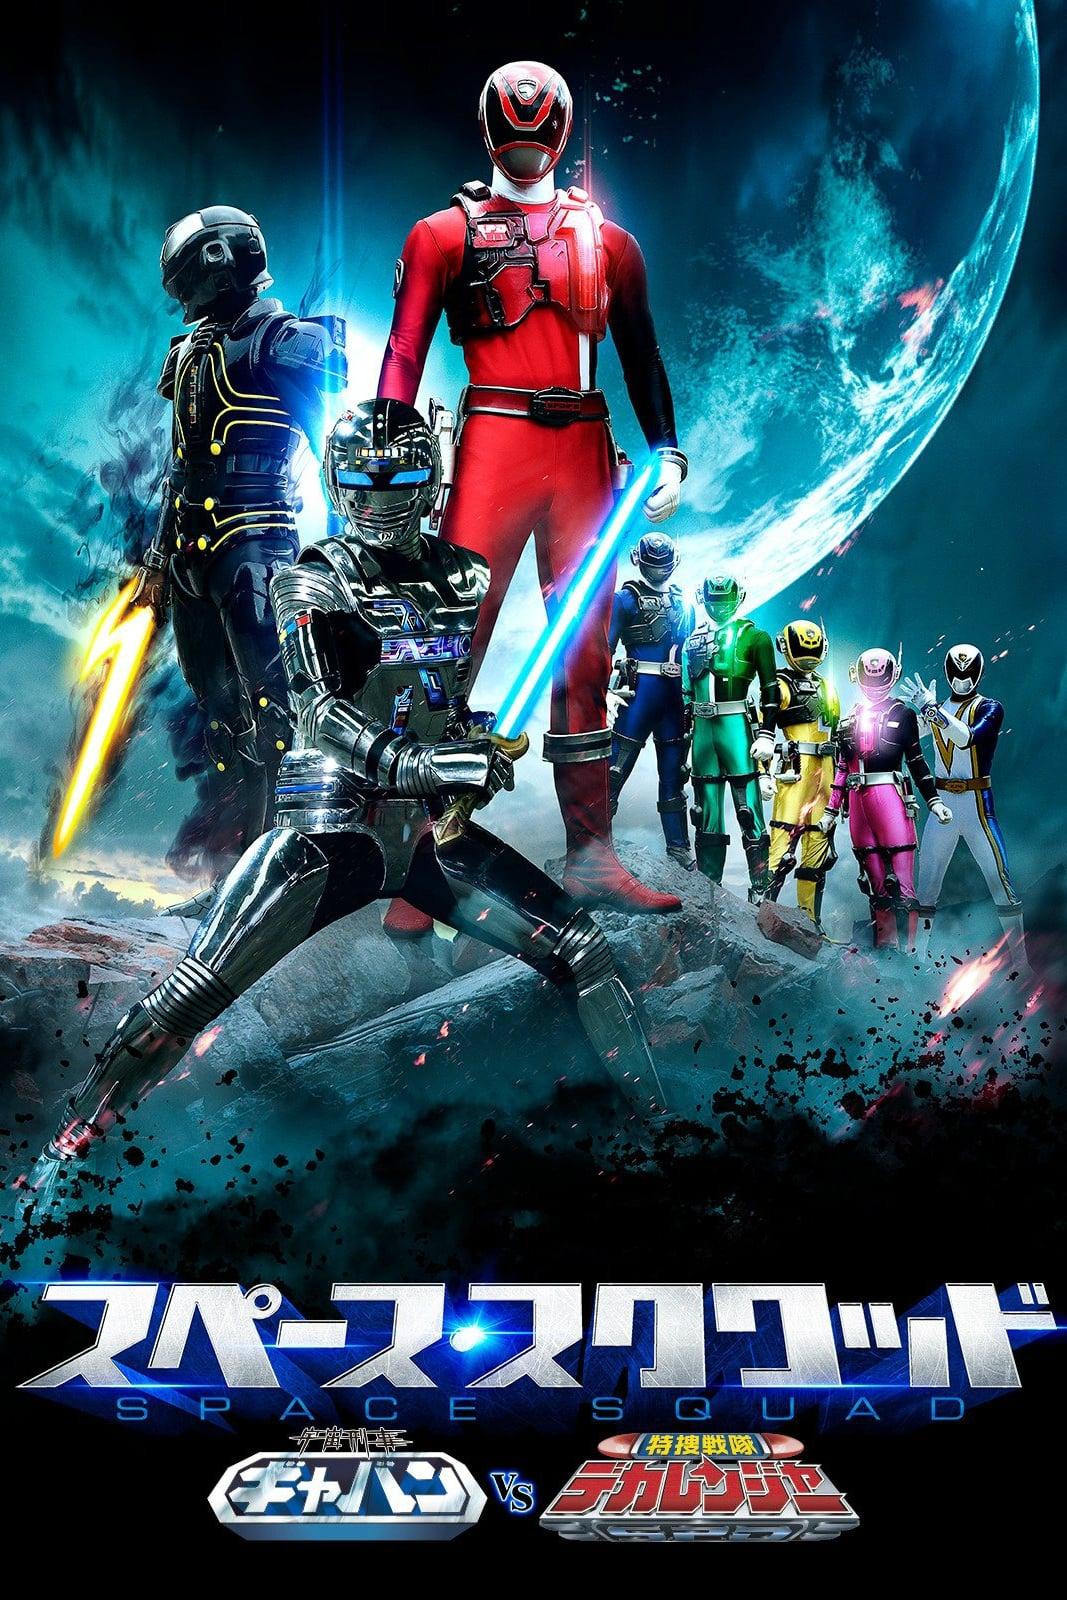 Space Squad Episode 1 : Space Sheriff Gavan vs. Tokusou Sentai Dekaranger